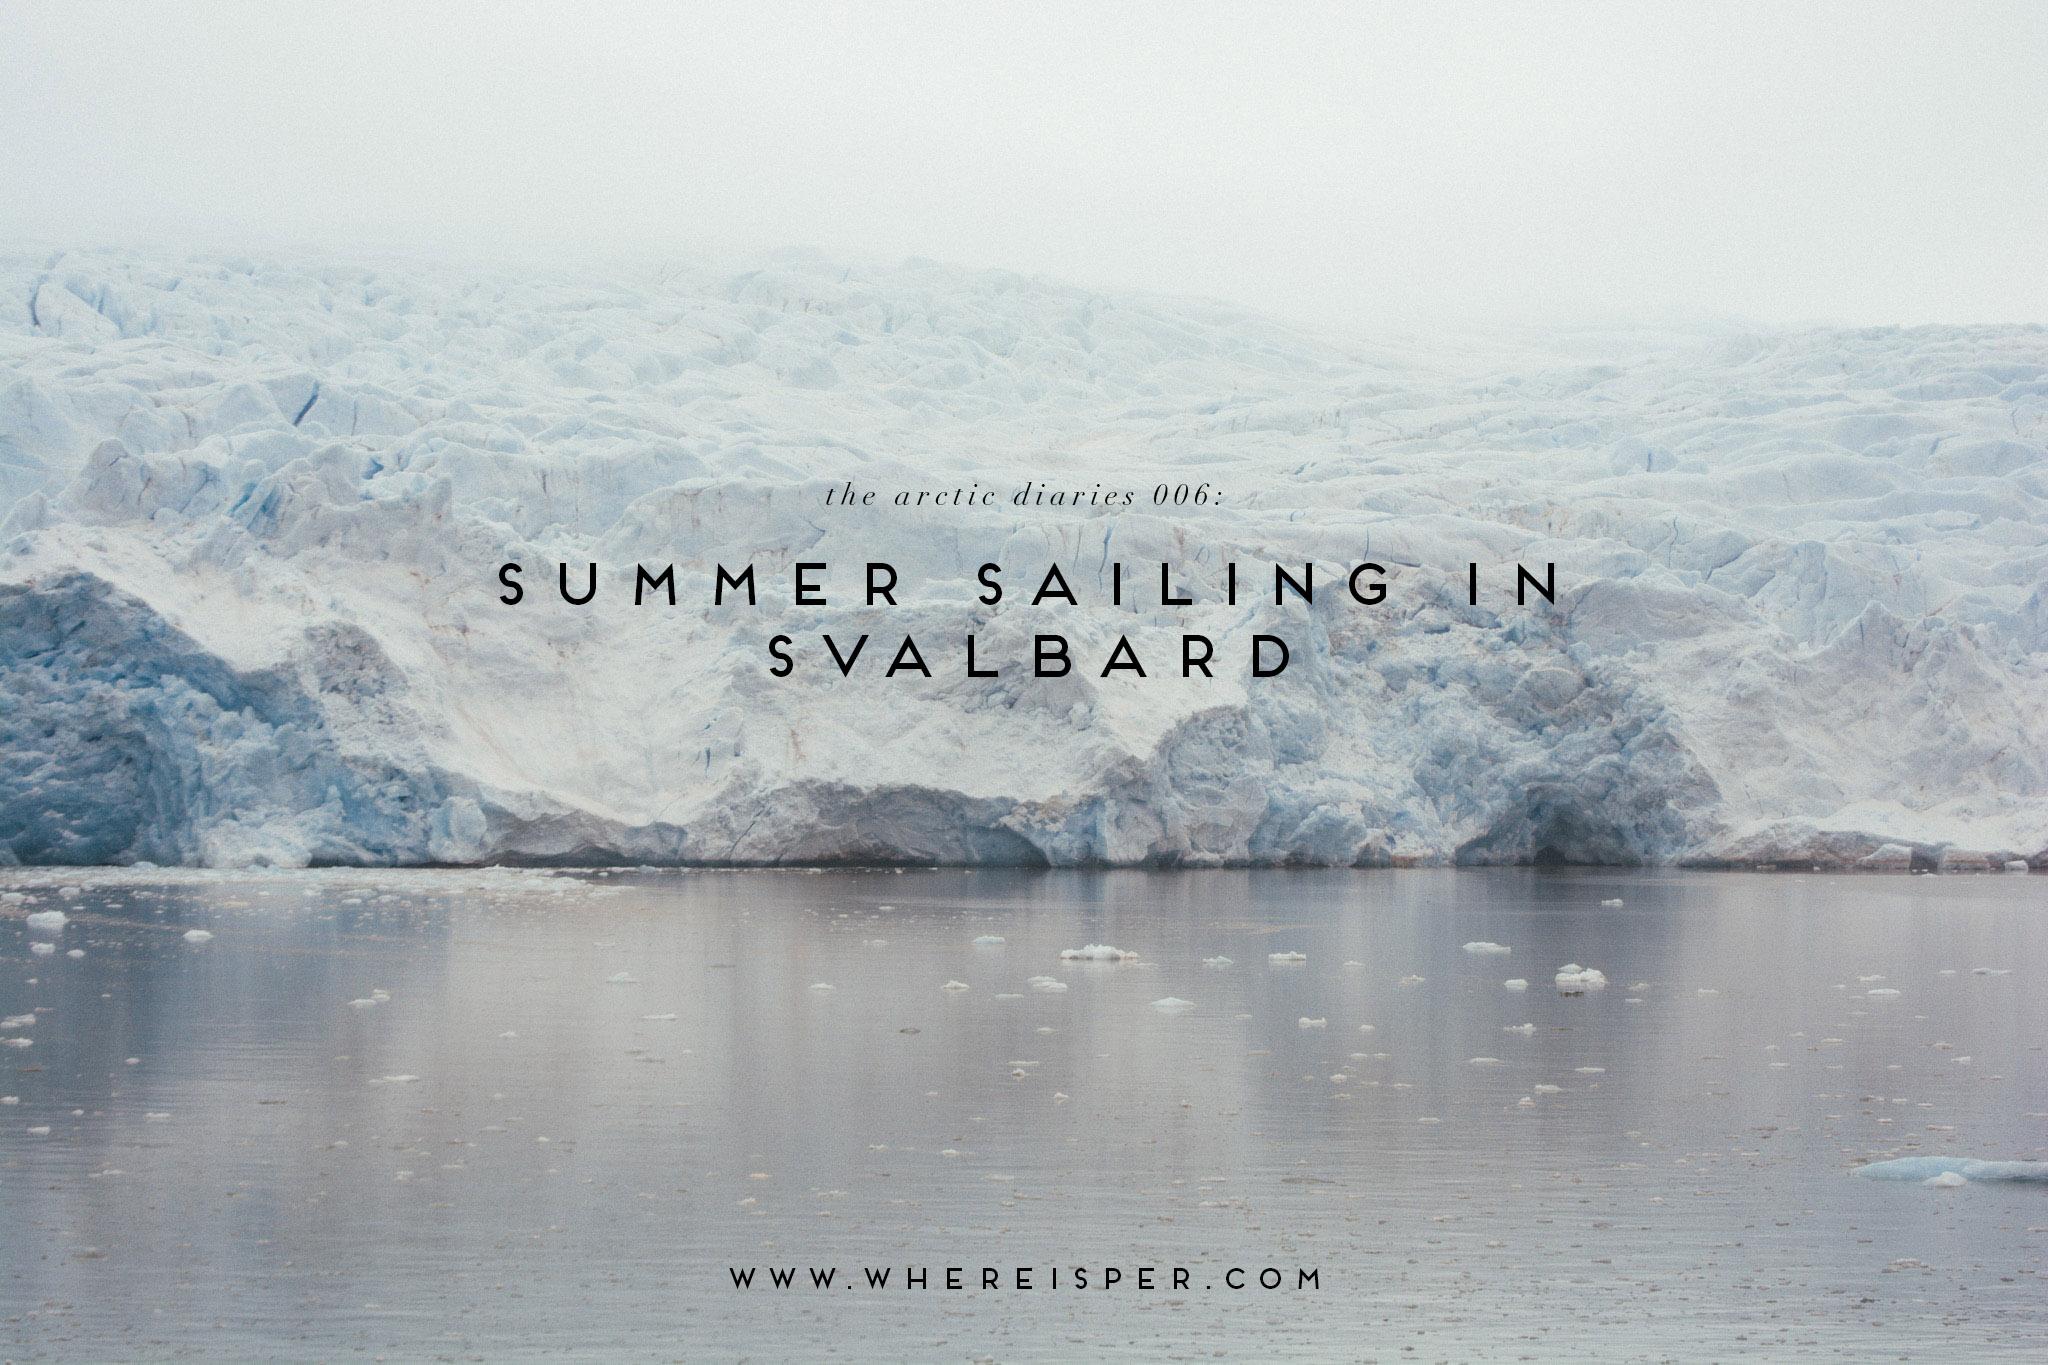 summersailing in svalbard_whereisper_cover.jpg